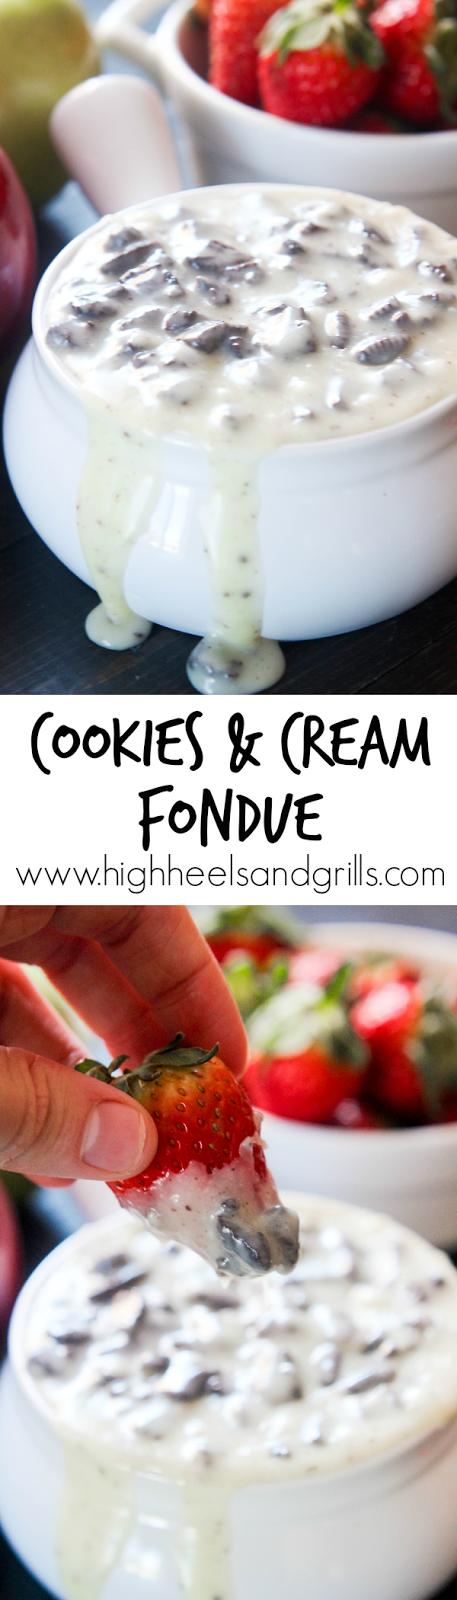 Cookies and Cream Fondue #cookiesandcreamcake